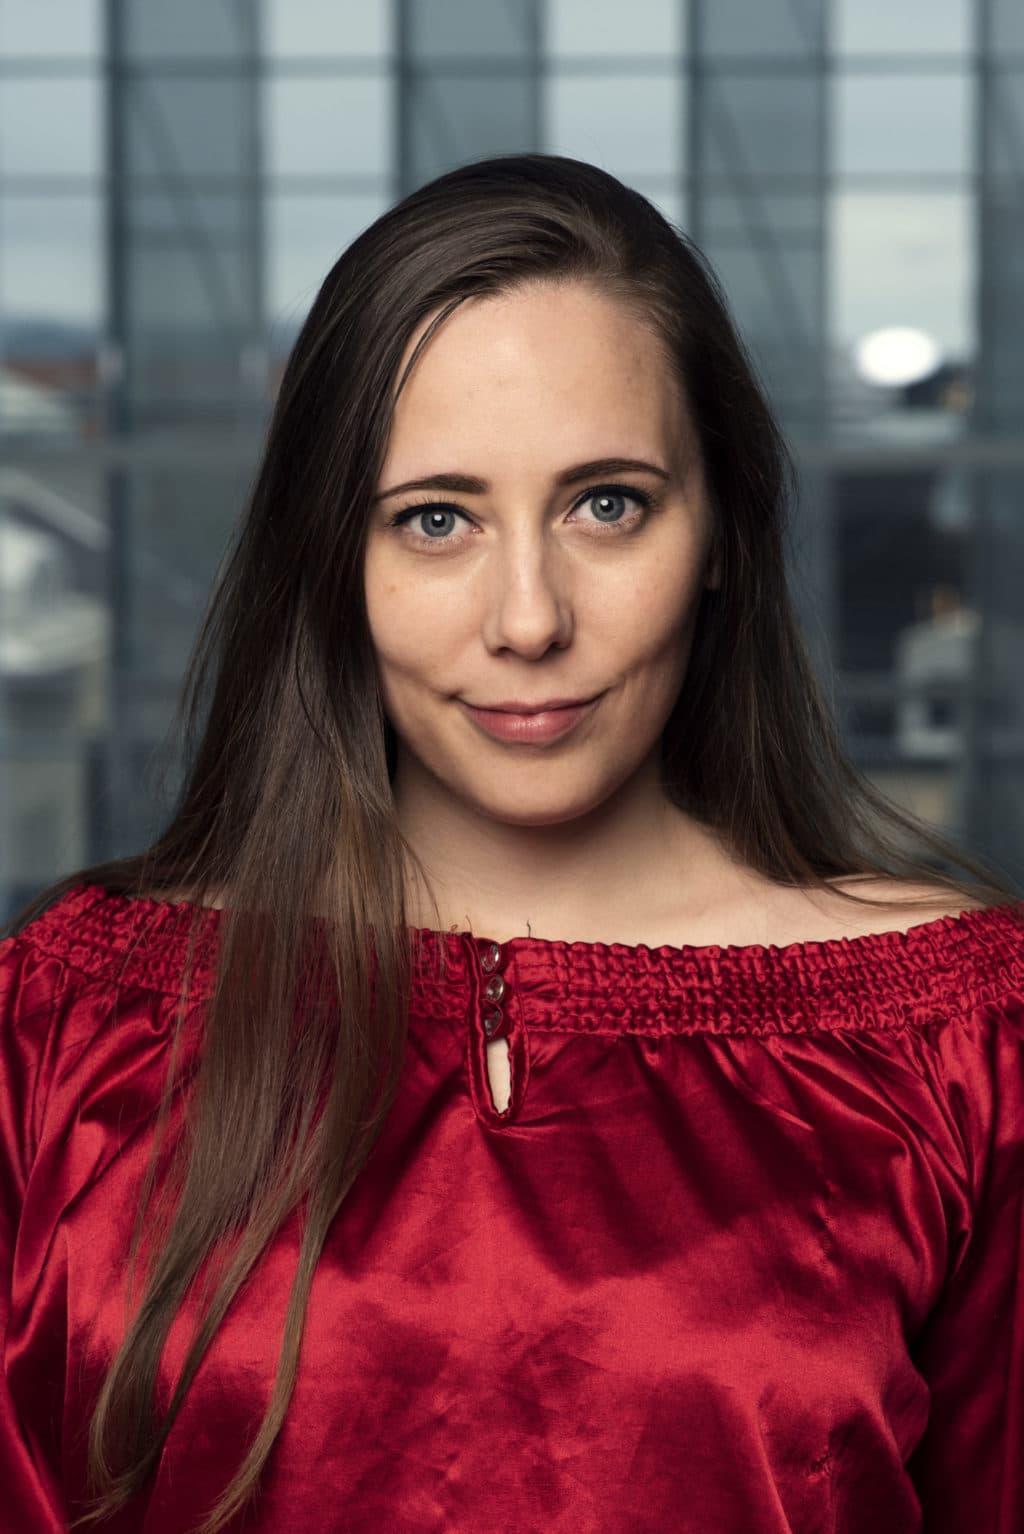 Portrett av Silje Selina Larsen Sandvik